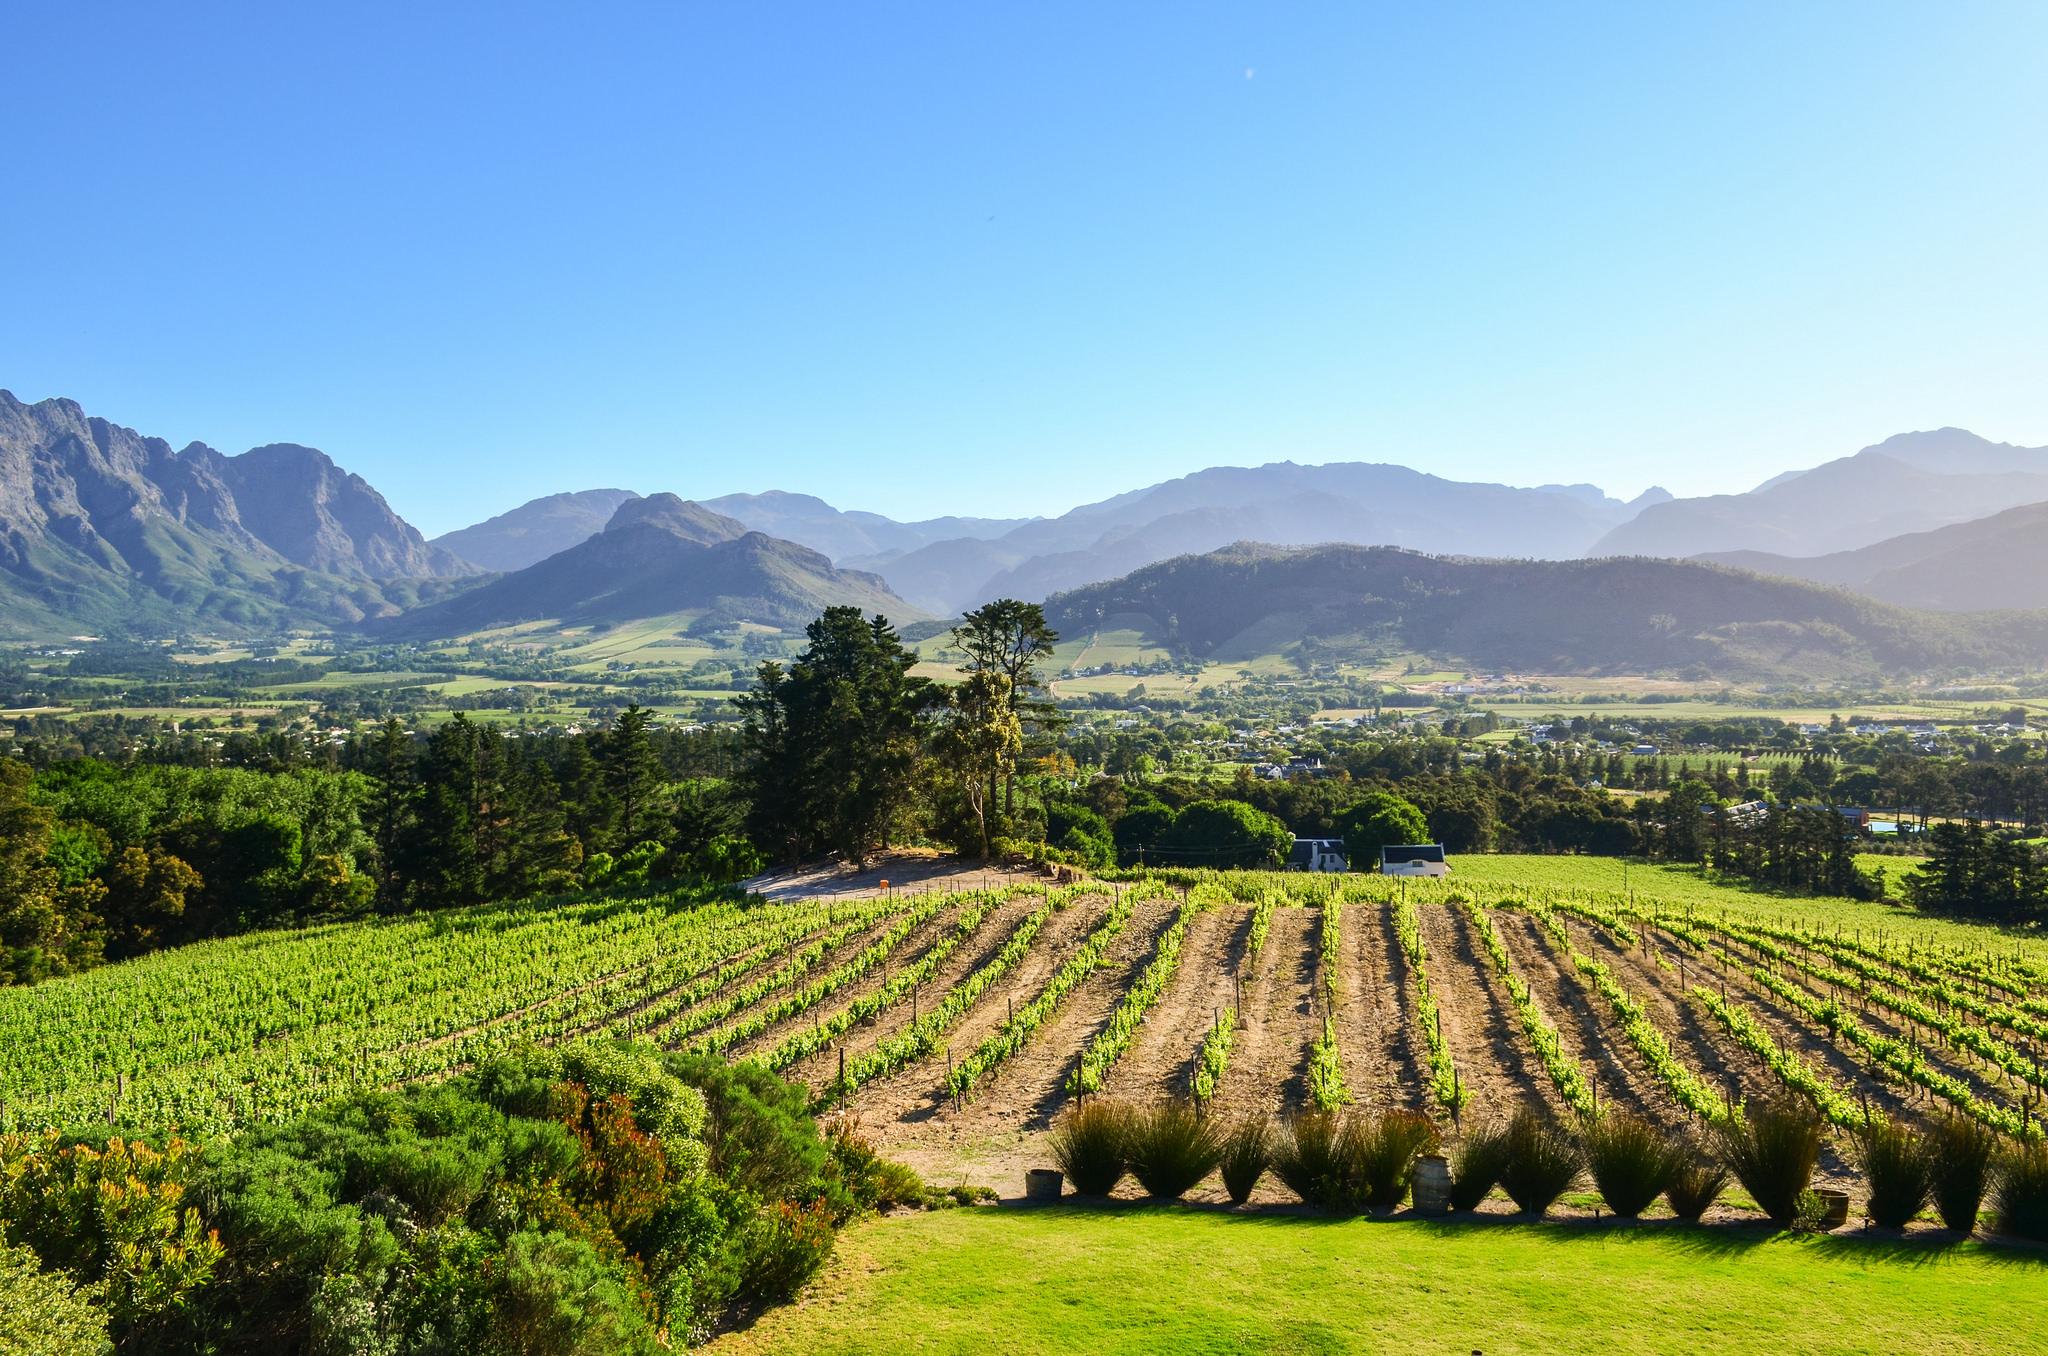 Franschhoek in the Cape Winelands